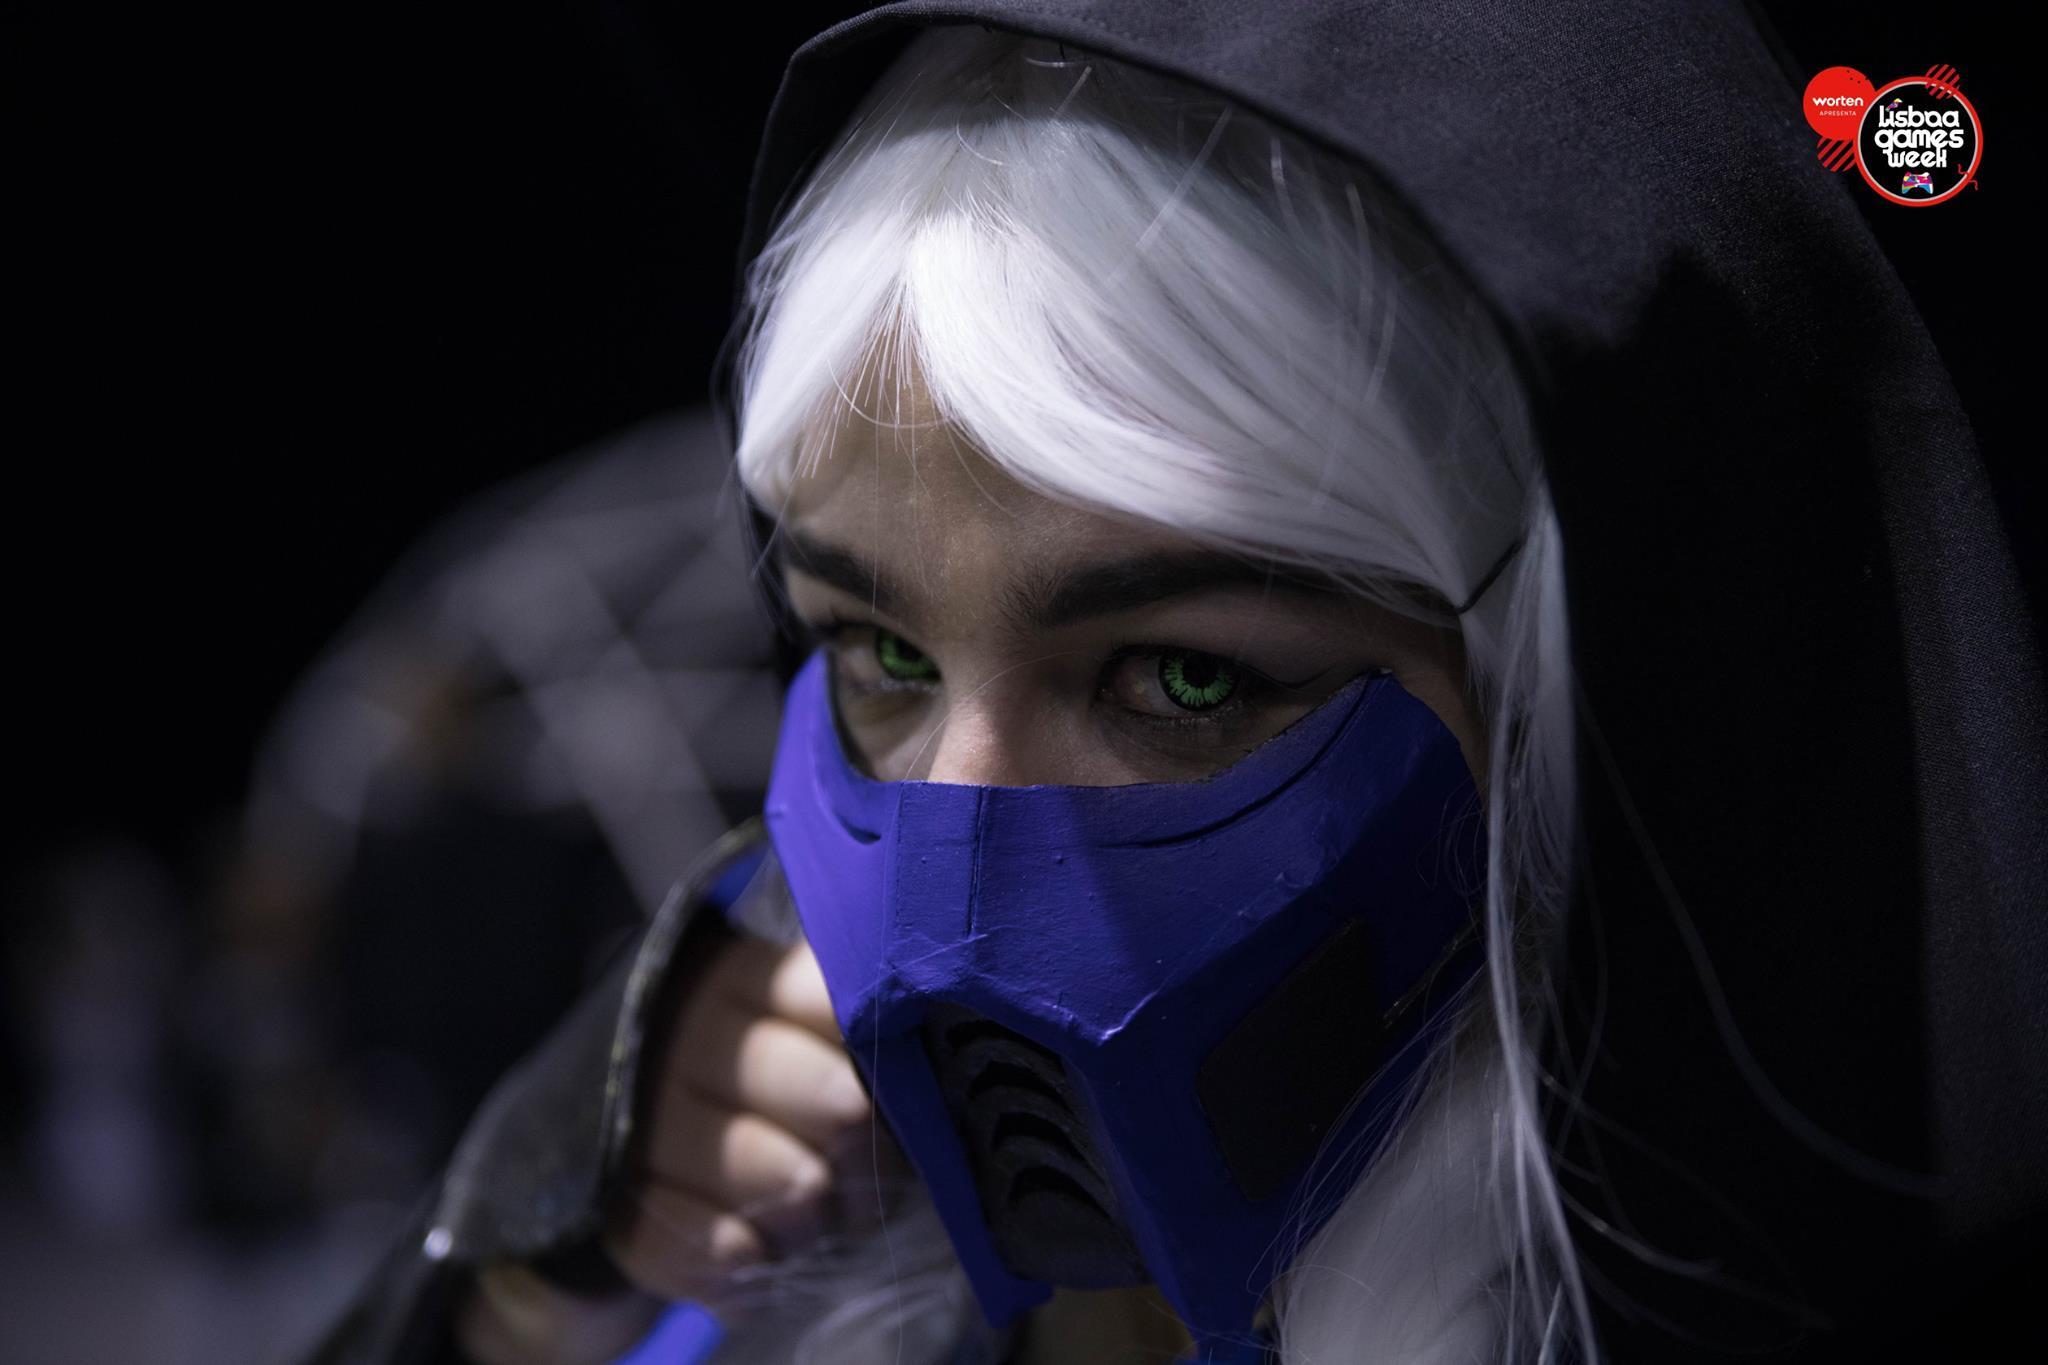 Lisboa Games Week 2017 FIL gaming god of war